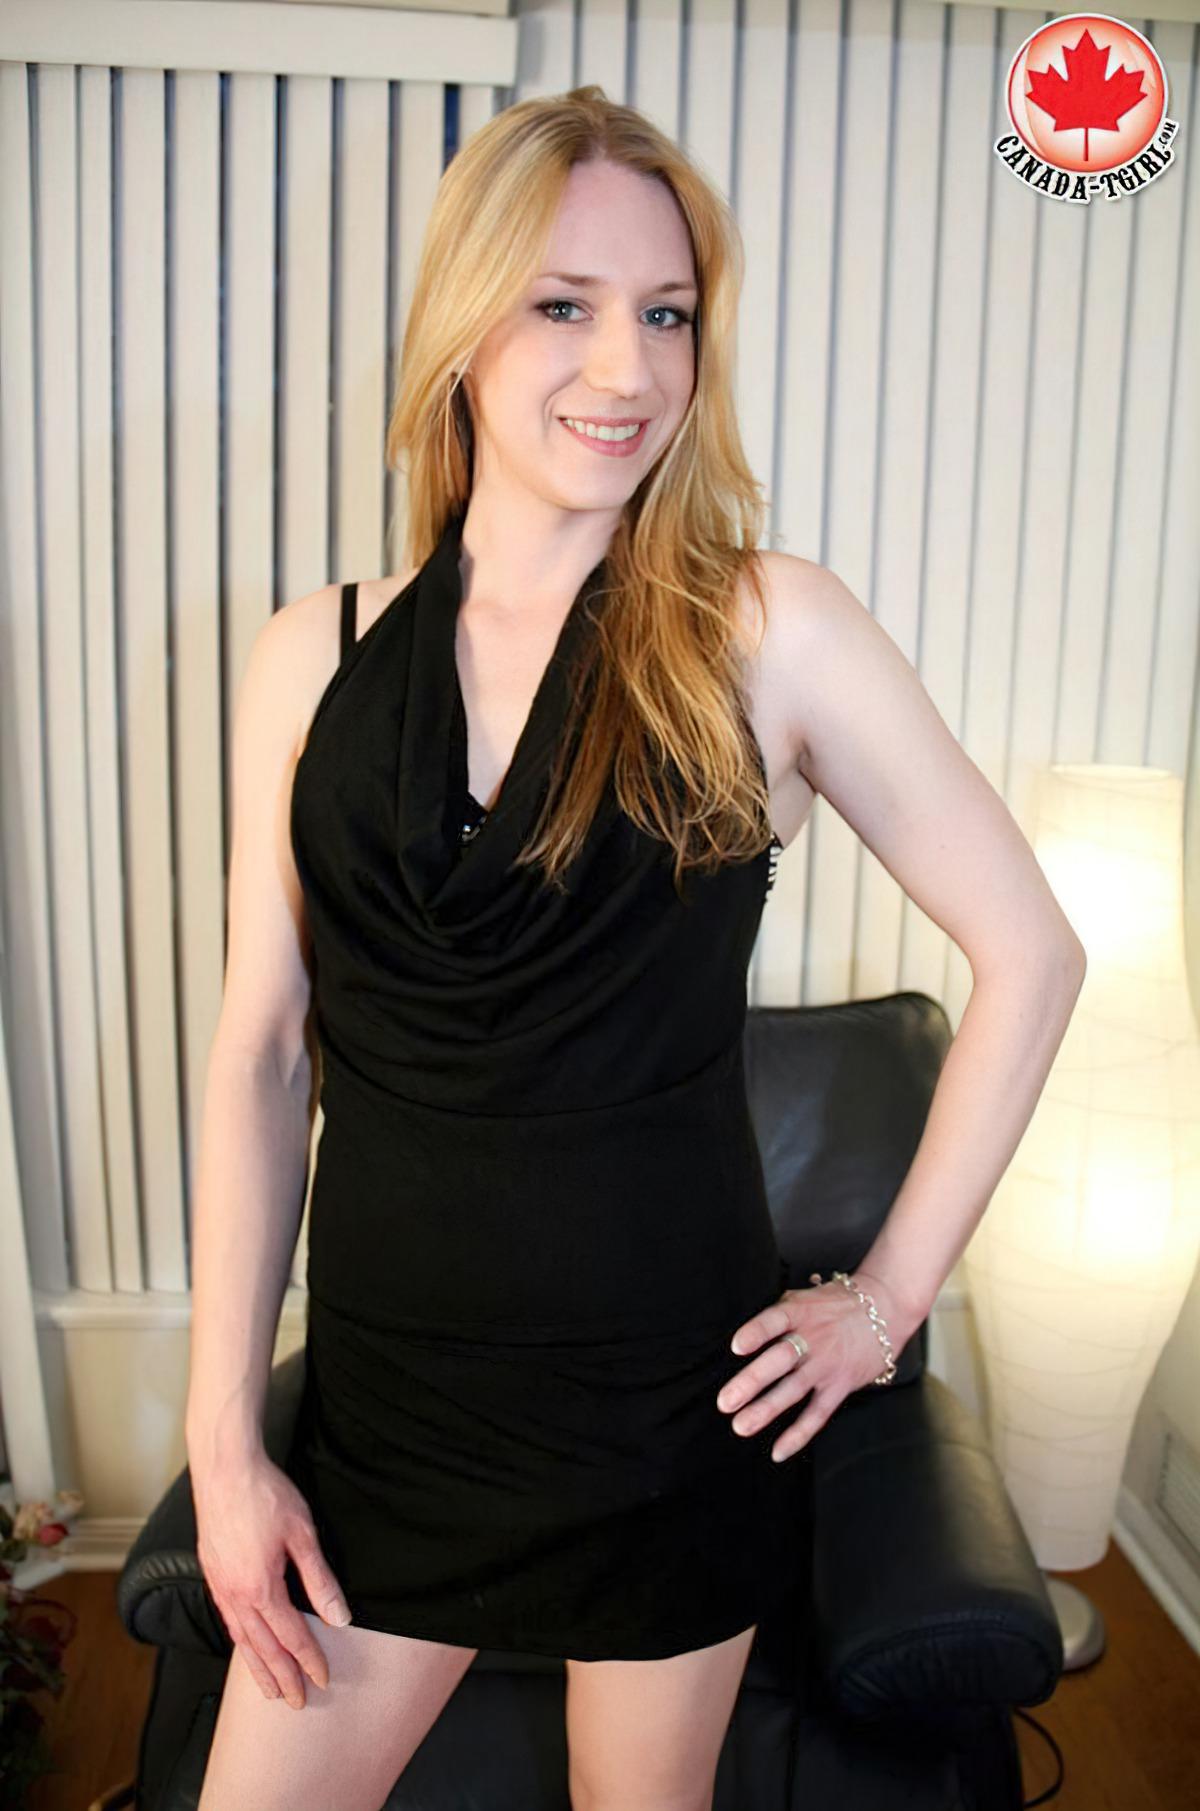 Travesti com Vestido Preto (1)